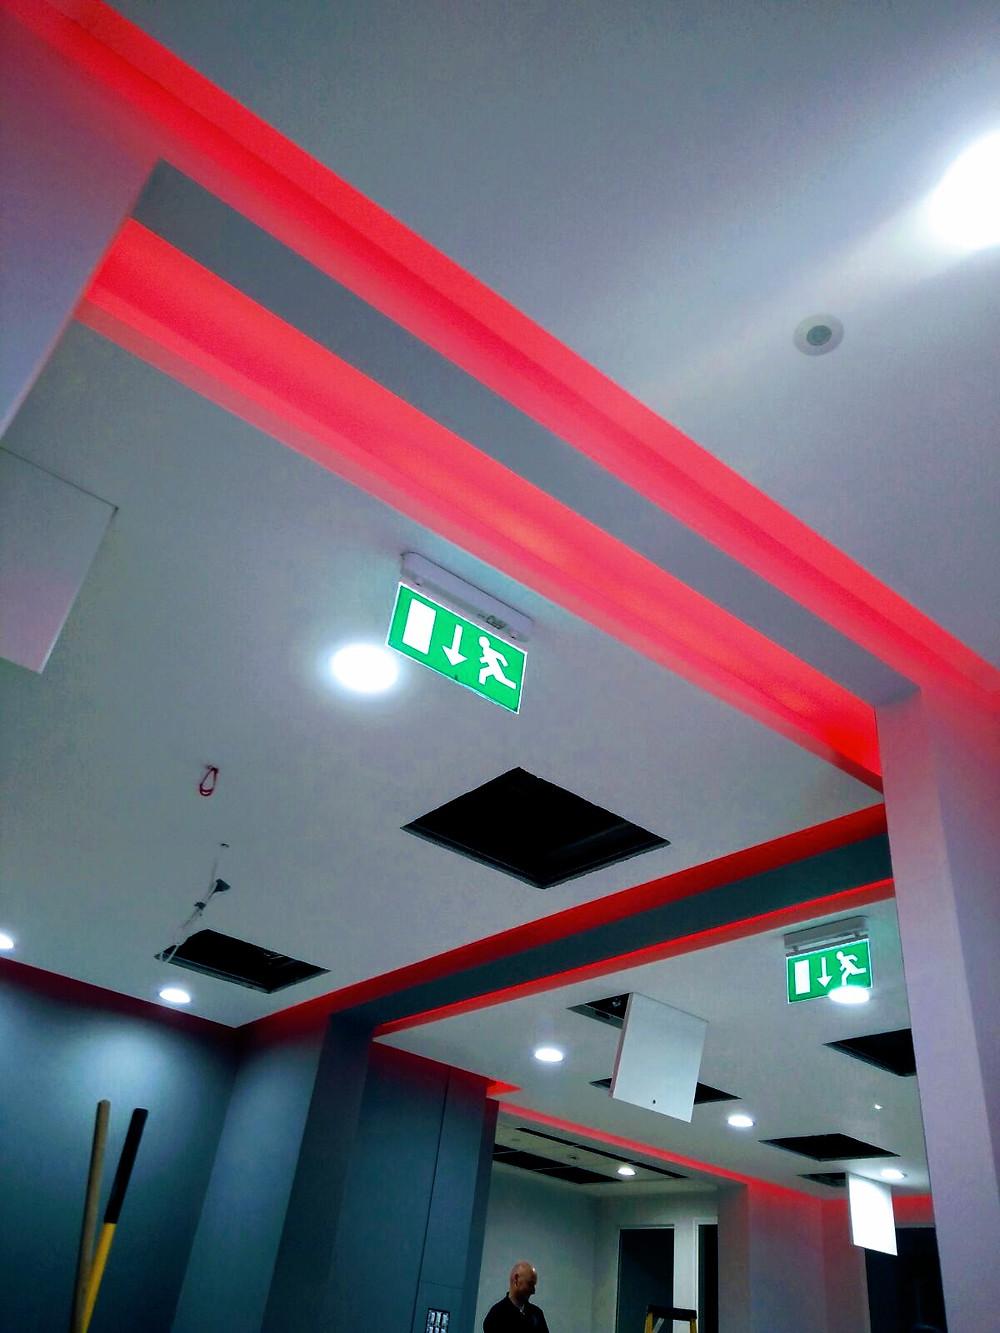 LED Lighting with emergency lighting